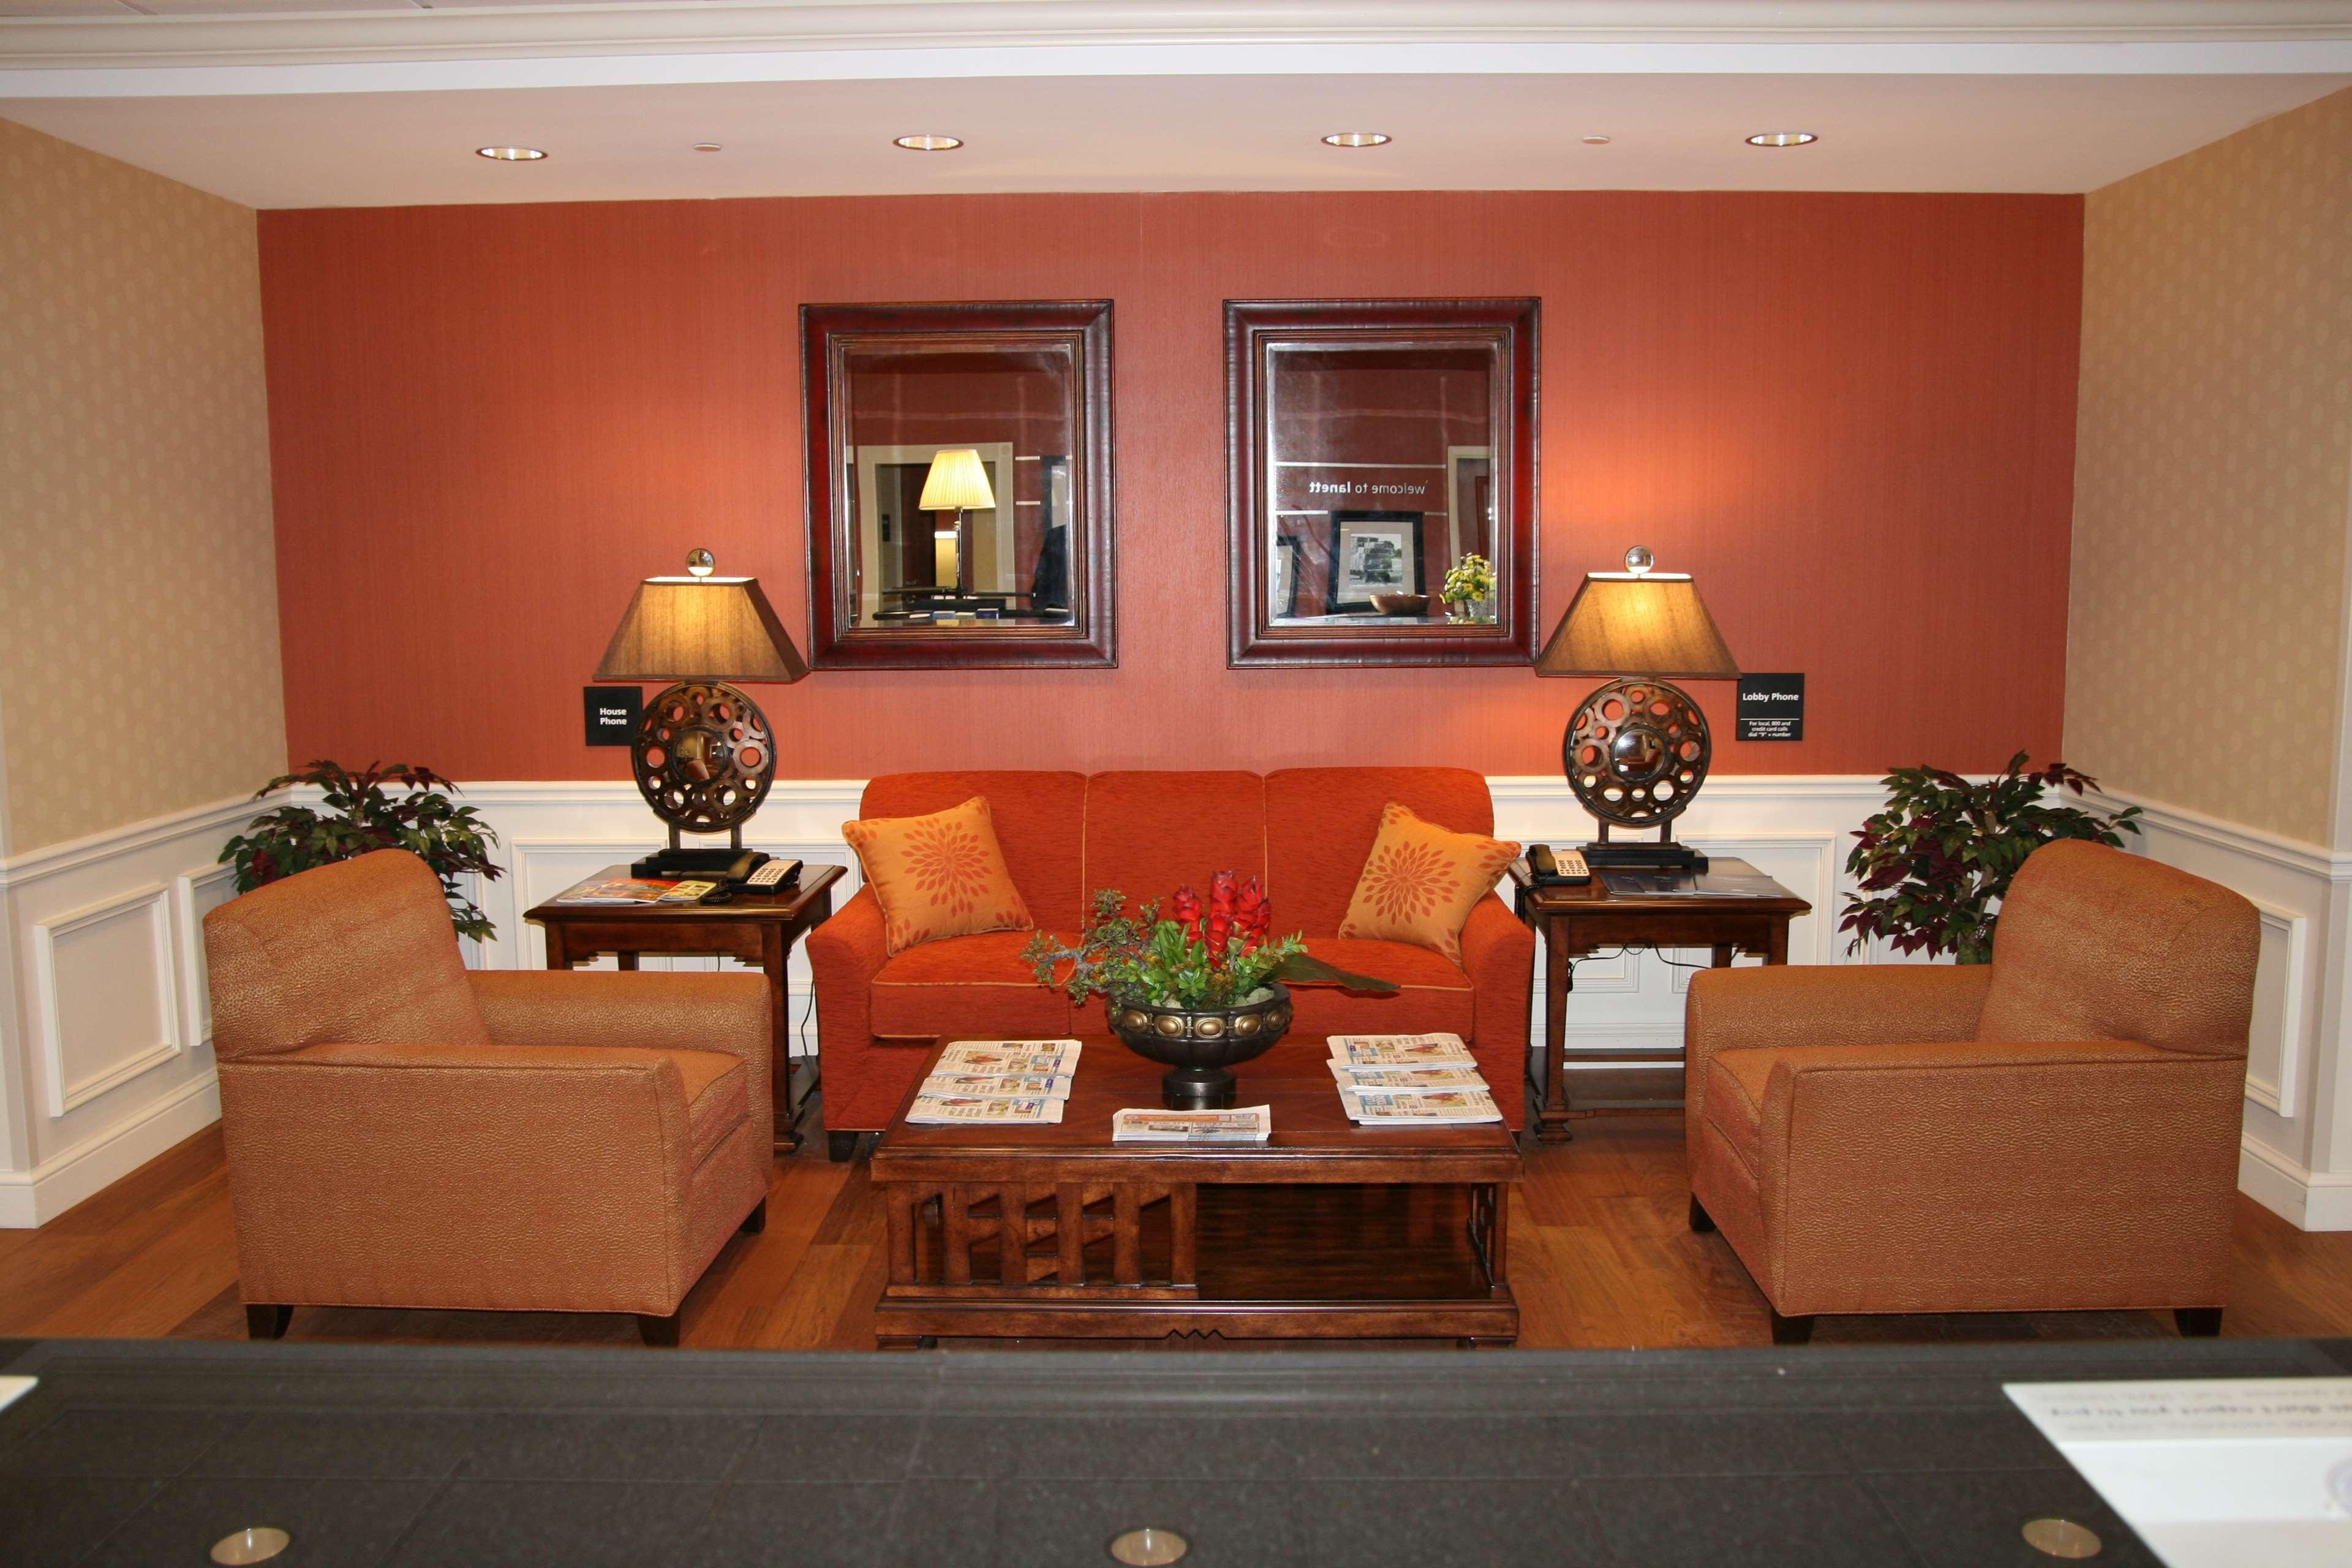 Hampton Inn & Suites Lanett-West Point image 9